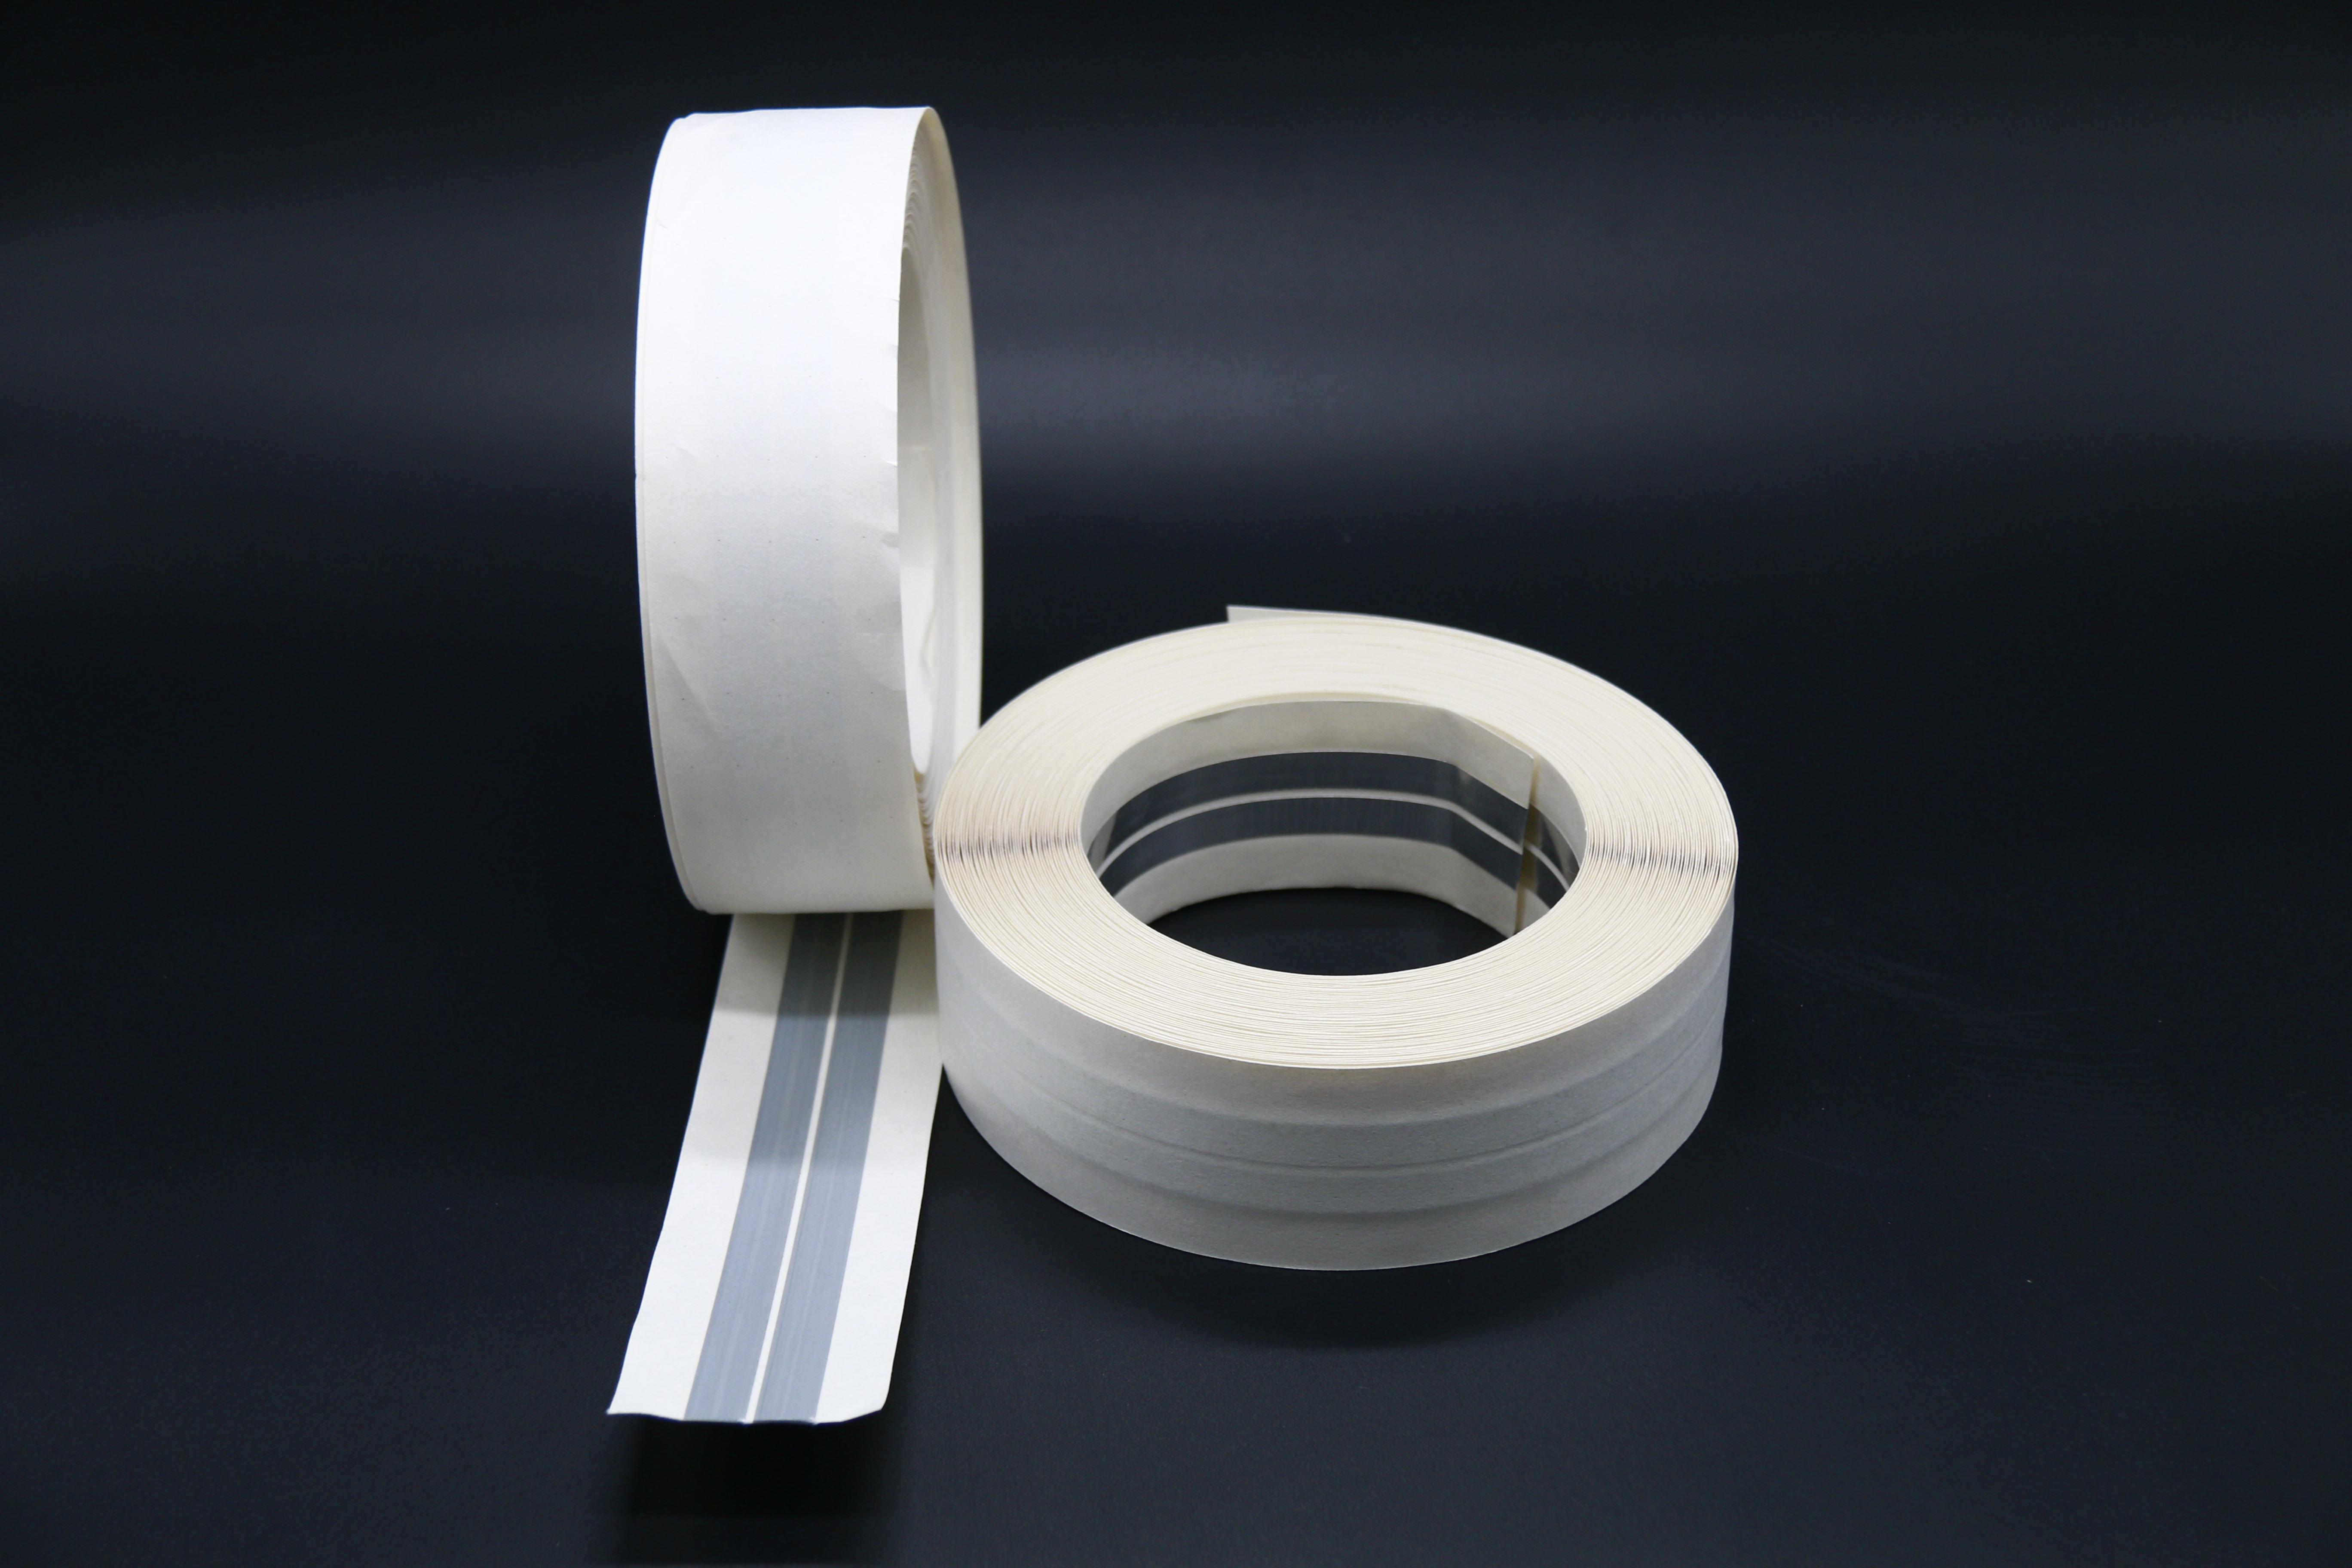 Galvanized Metal Corner Tape with Thickness 12-18um Featured Image